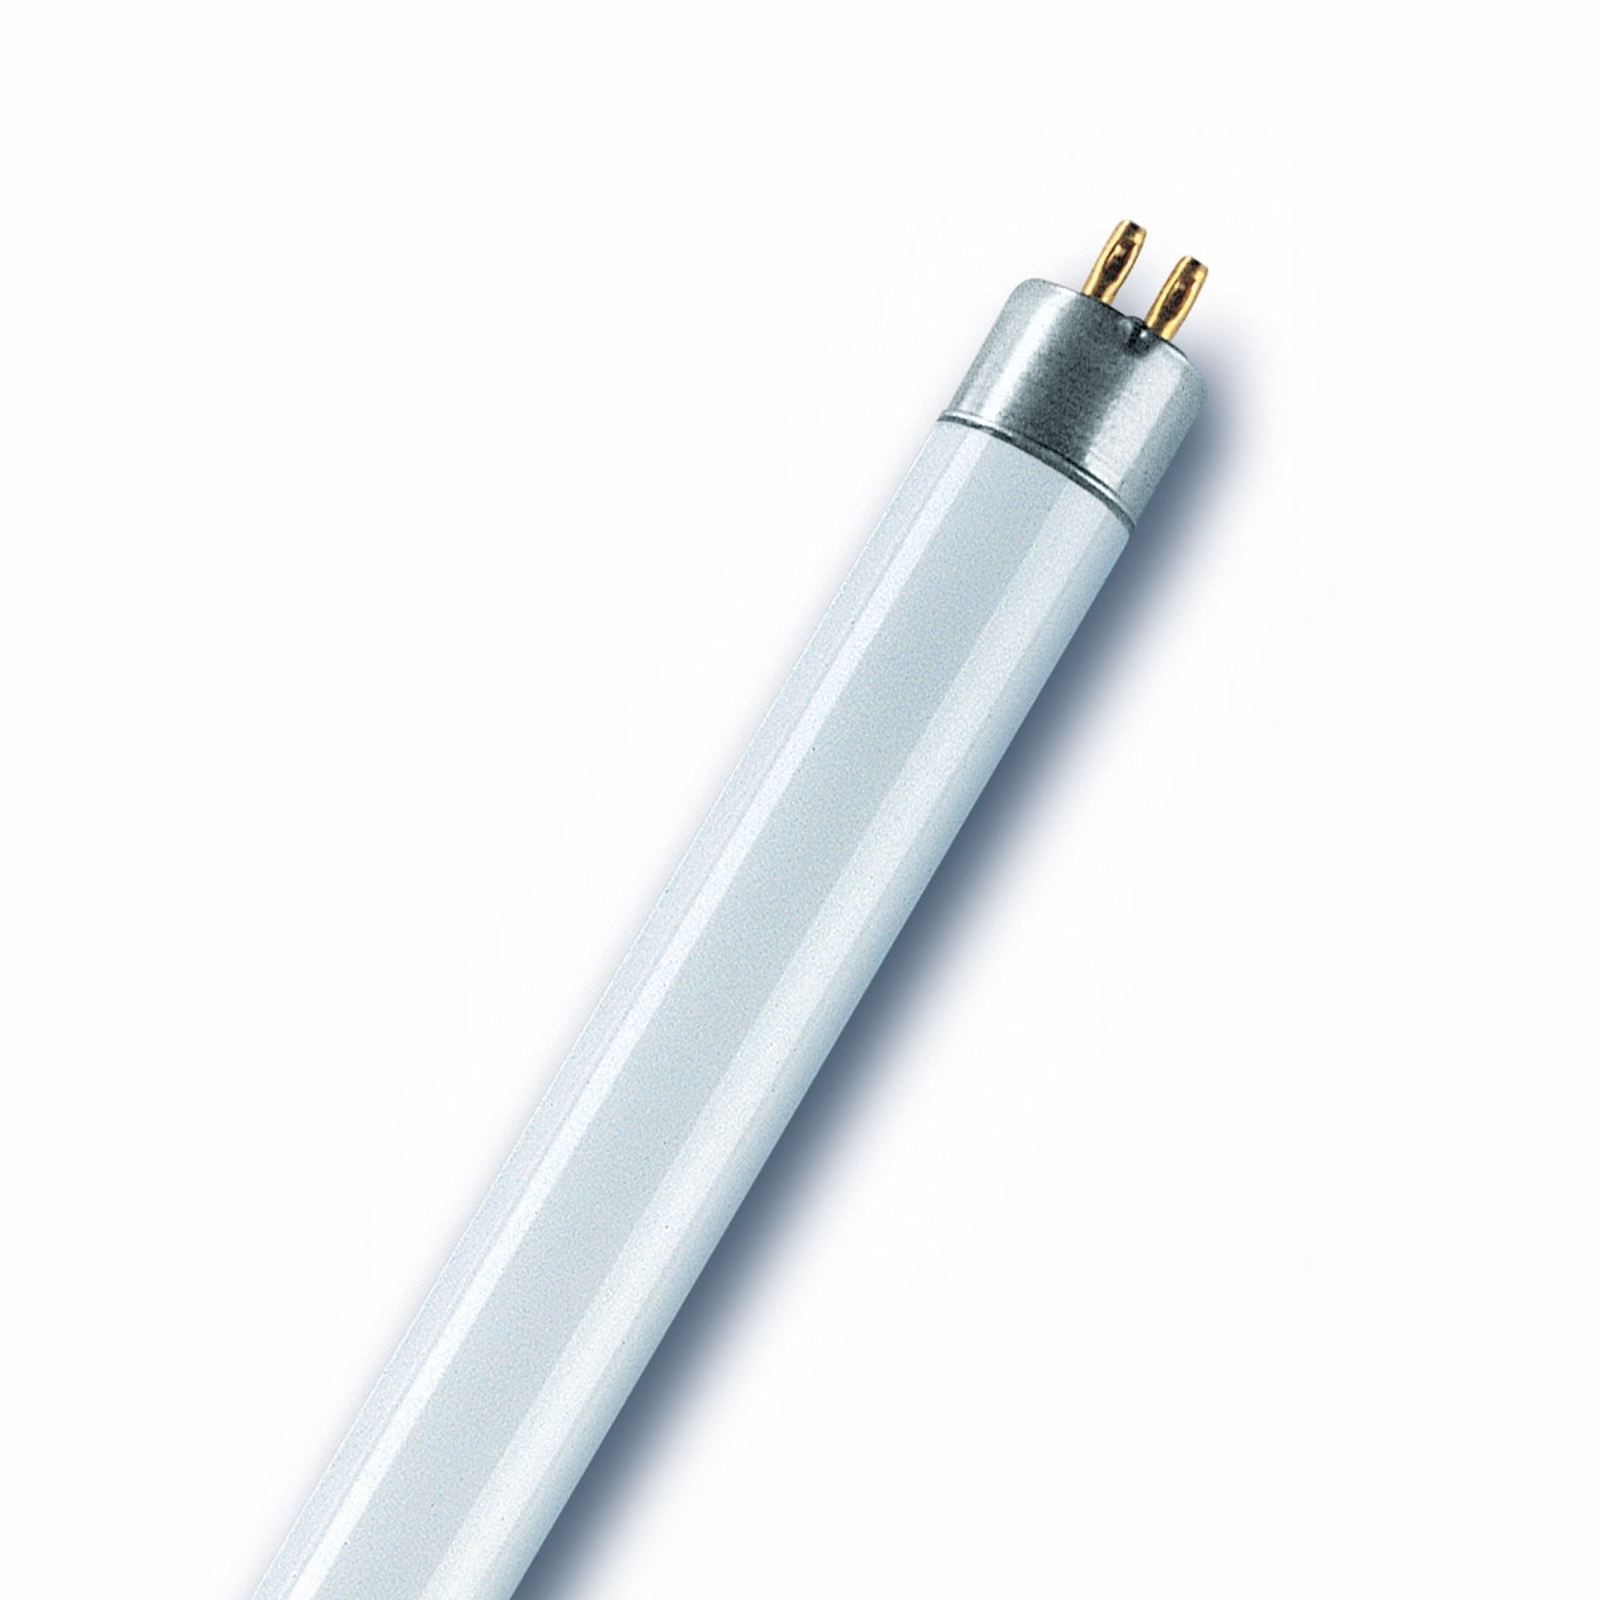 Leuchtstoffröhre G5 T5 24W 865 Lumilux HO